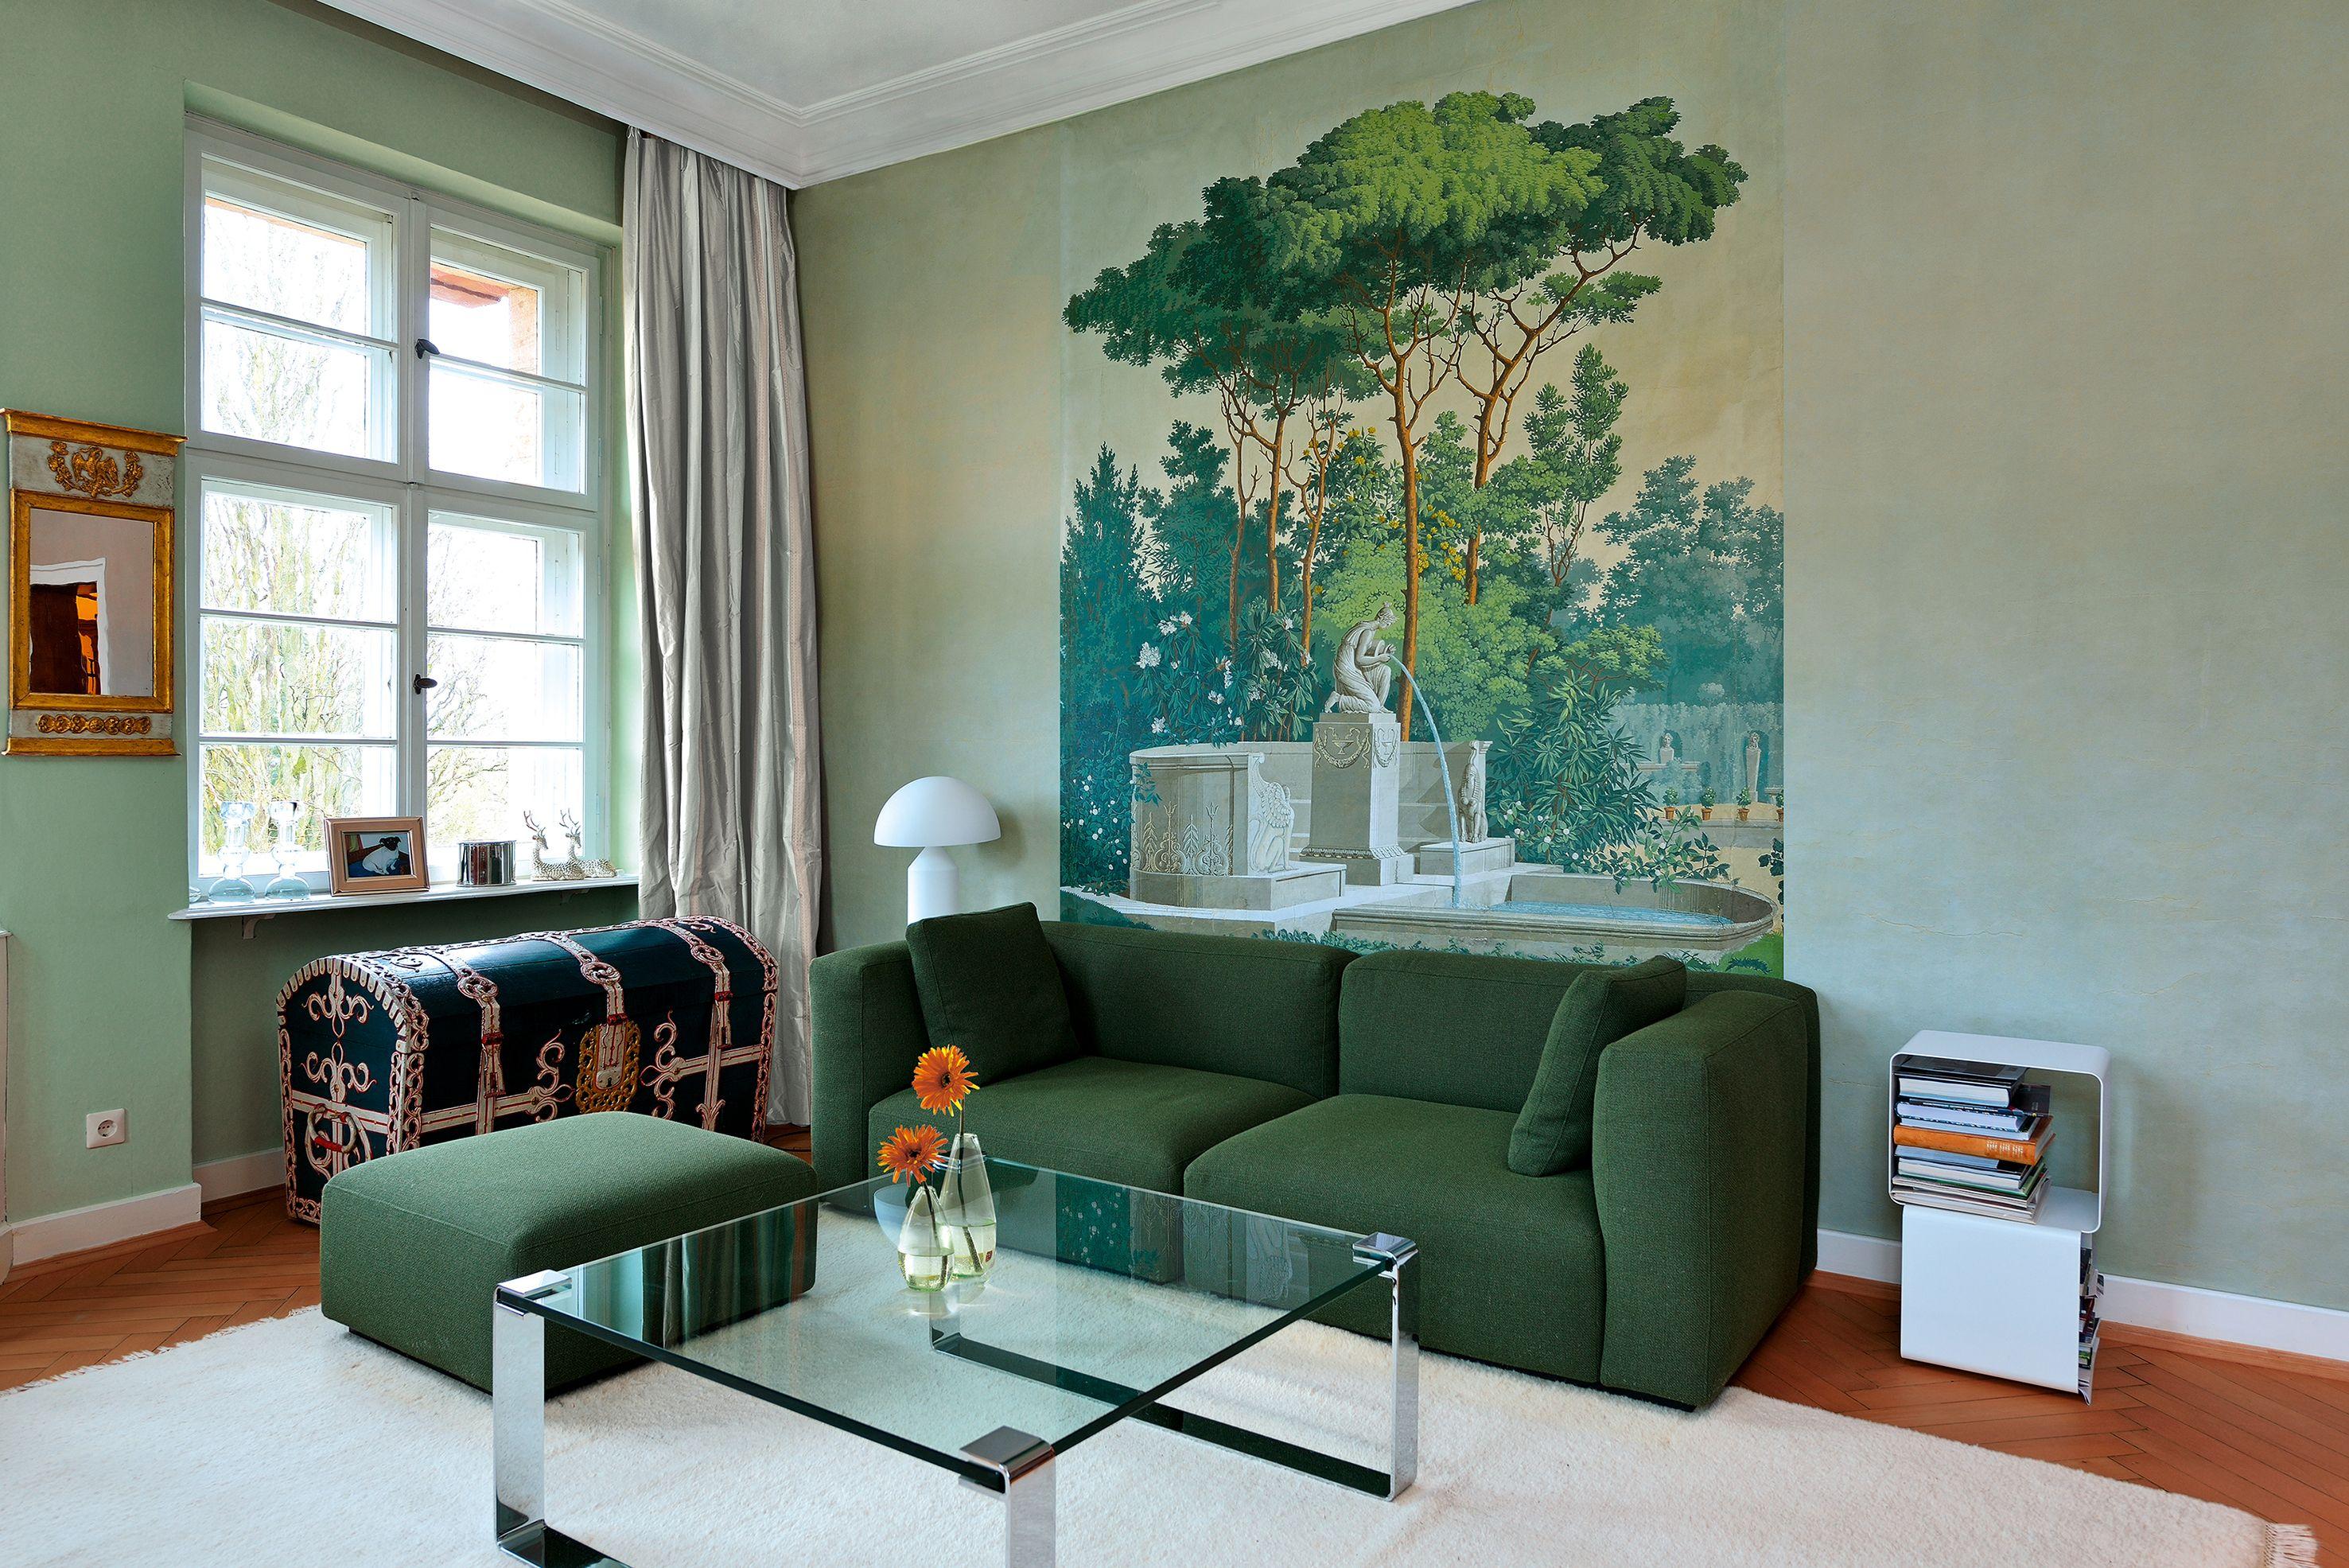 Home interior tapeten design marburger tapeten ucmuseoue  e tapetenmuster und stoffe  pinterest